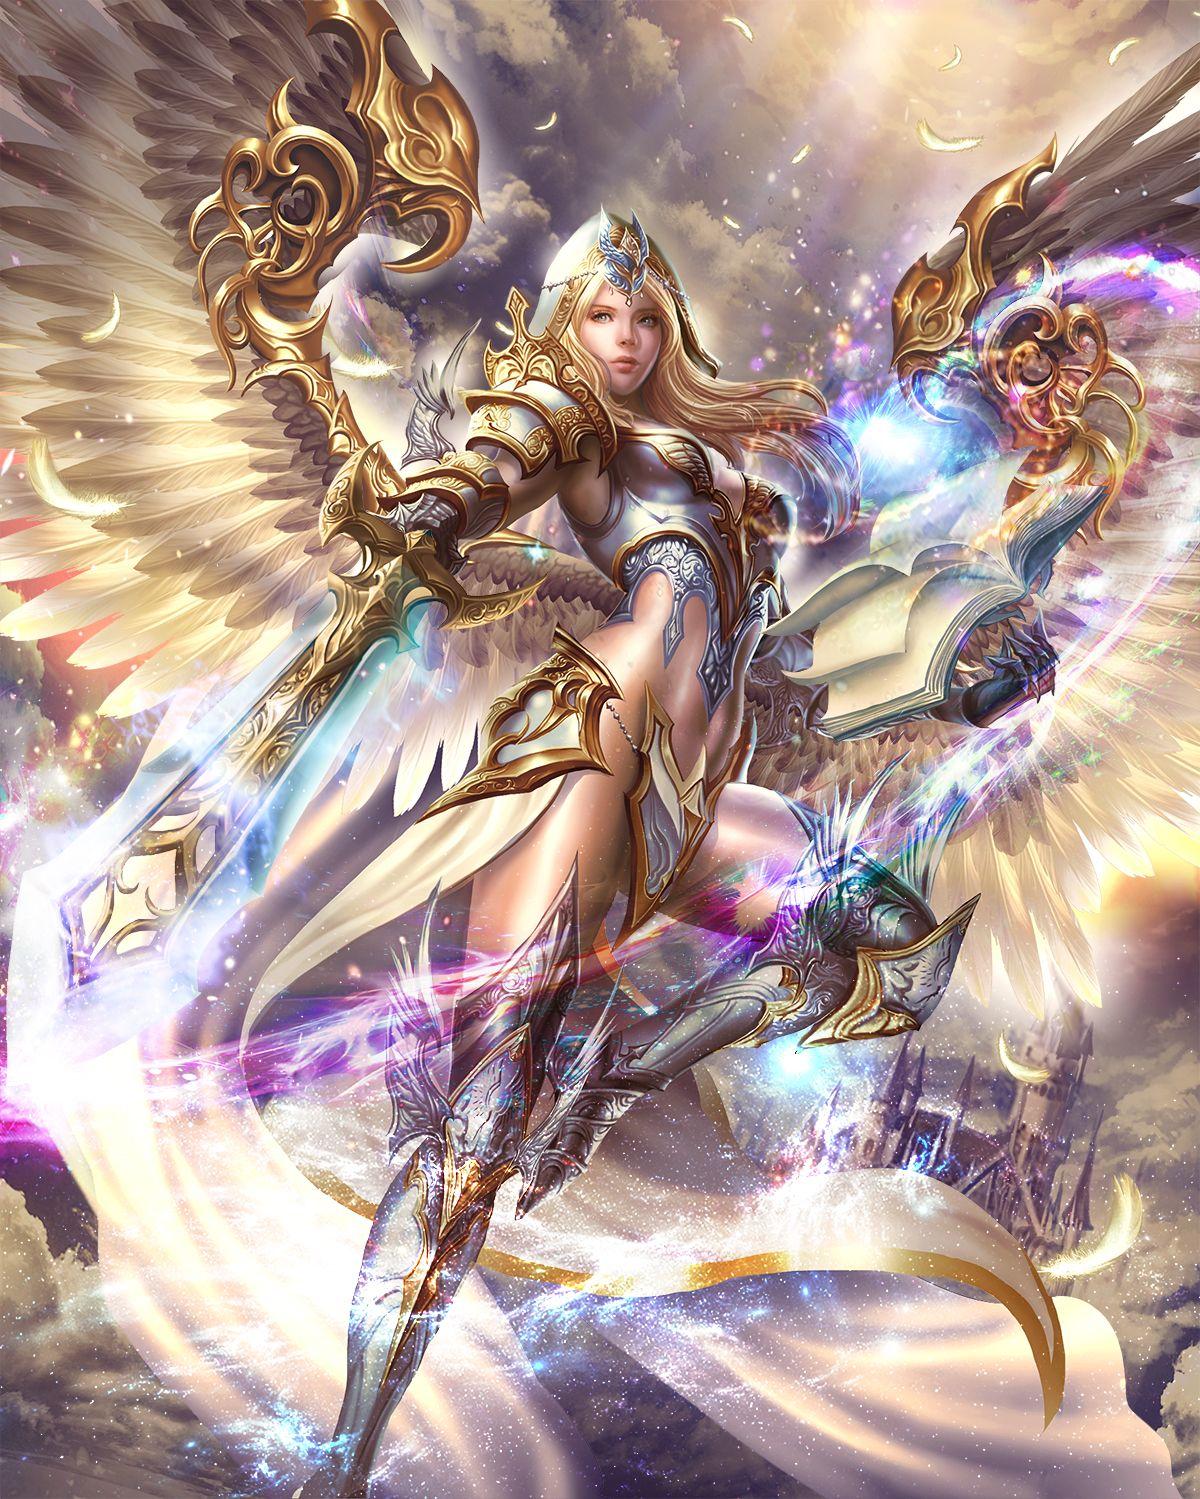 Mithra ii lik studio female sexy art - Anime female warrior ...